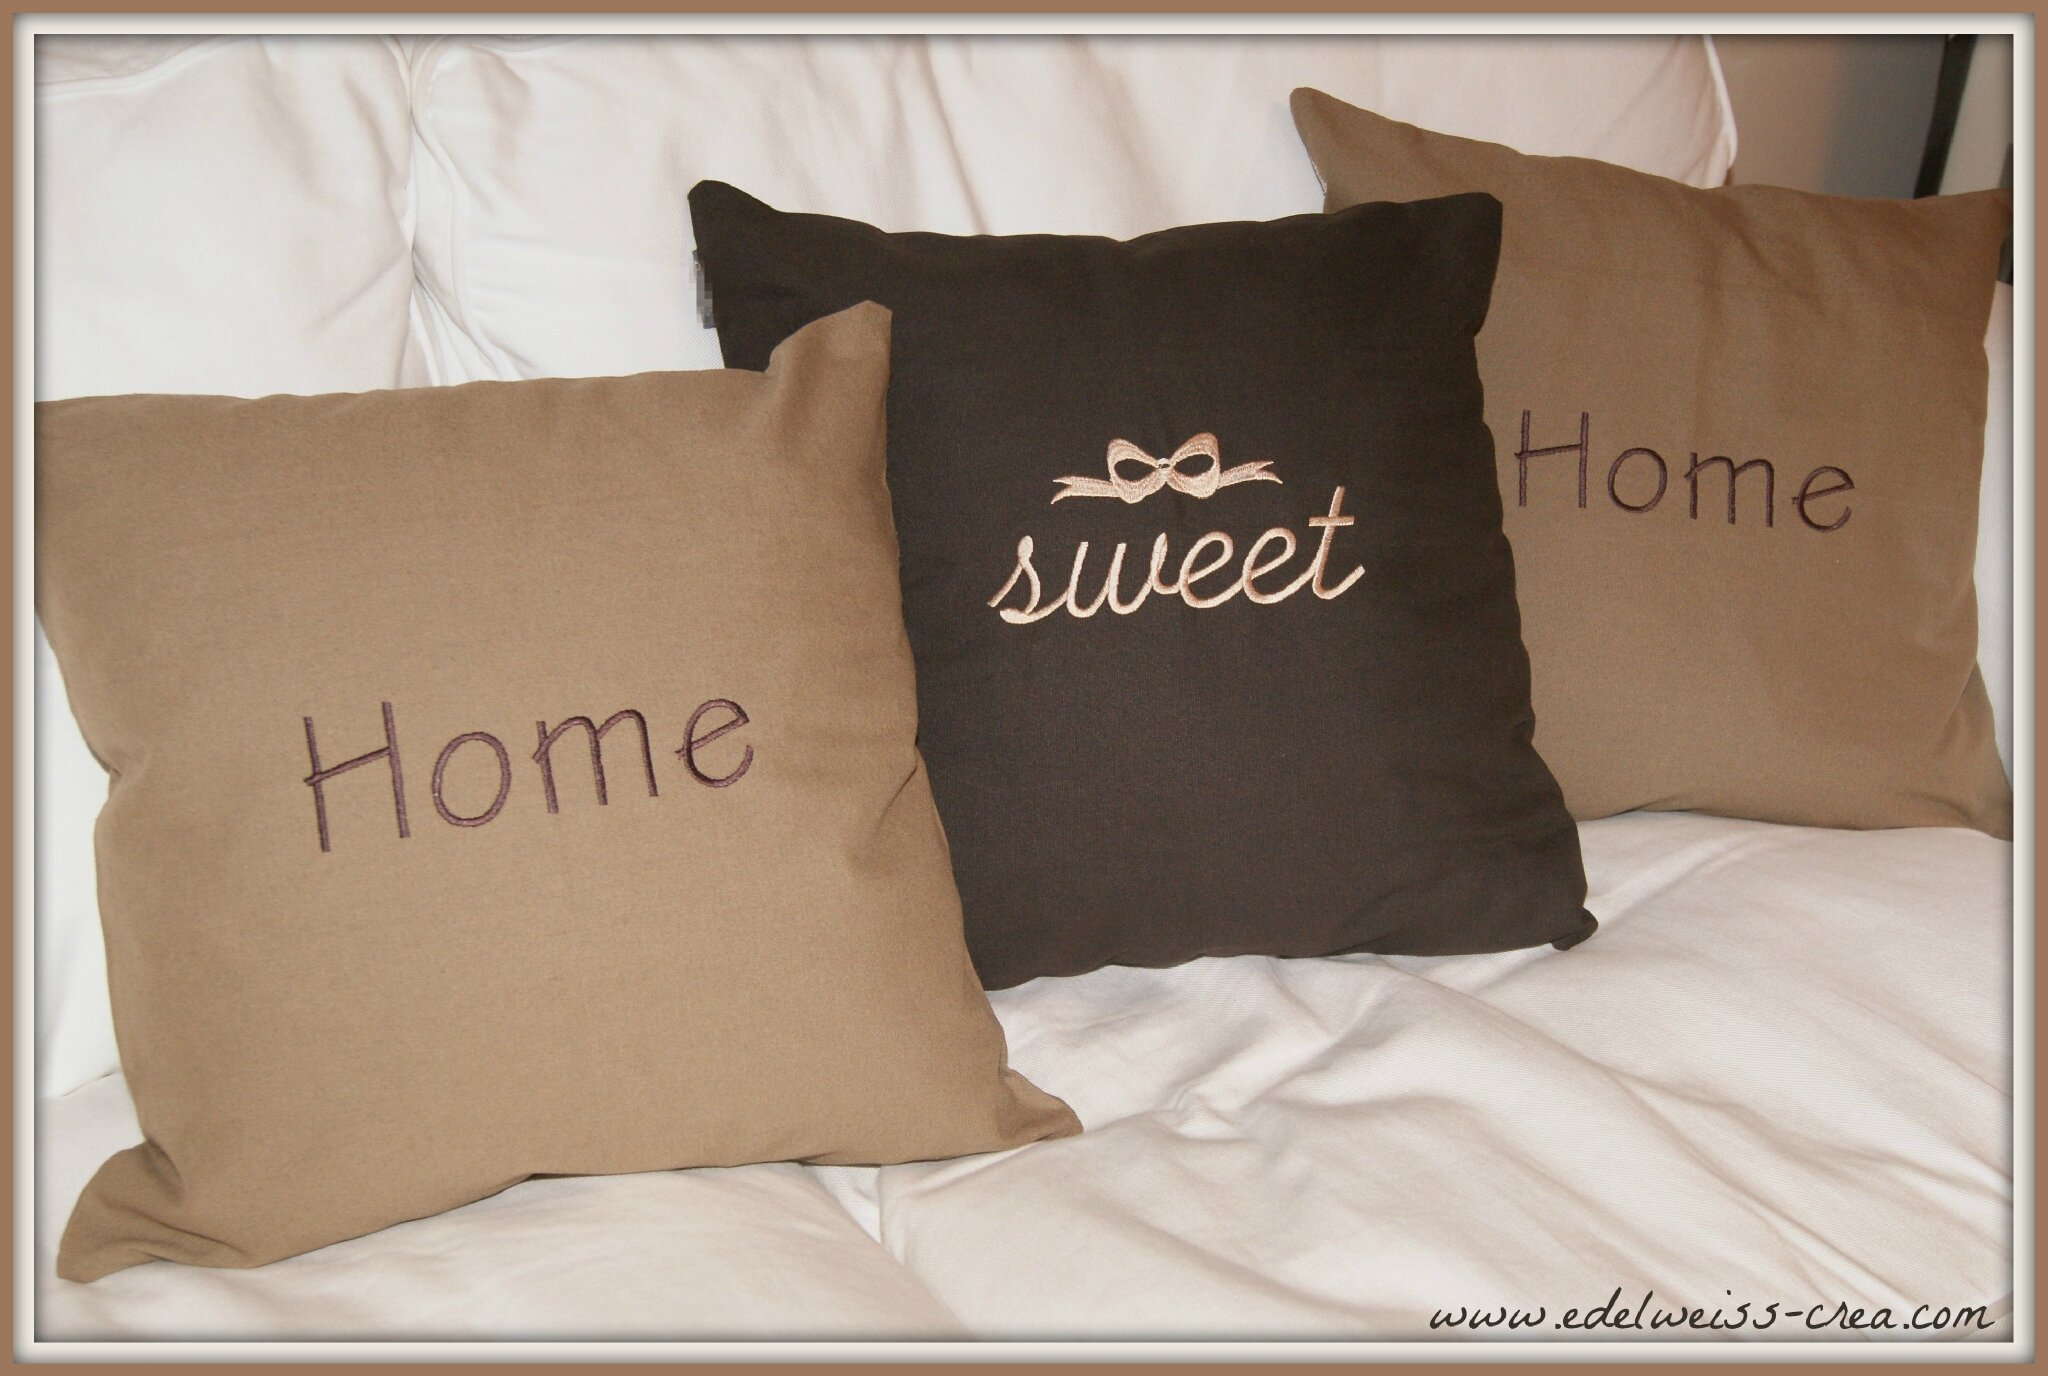 caramel et chocolat l 39 atelier d 39 edelweiss. Black Bedroom Furniture Sets. Home Design Ideas